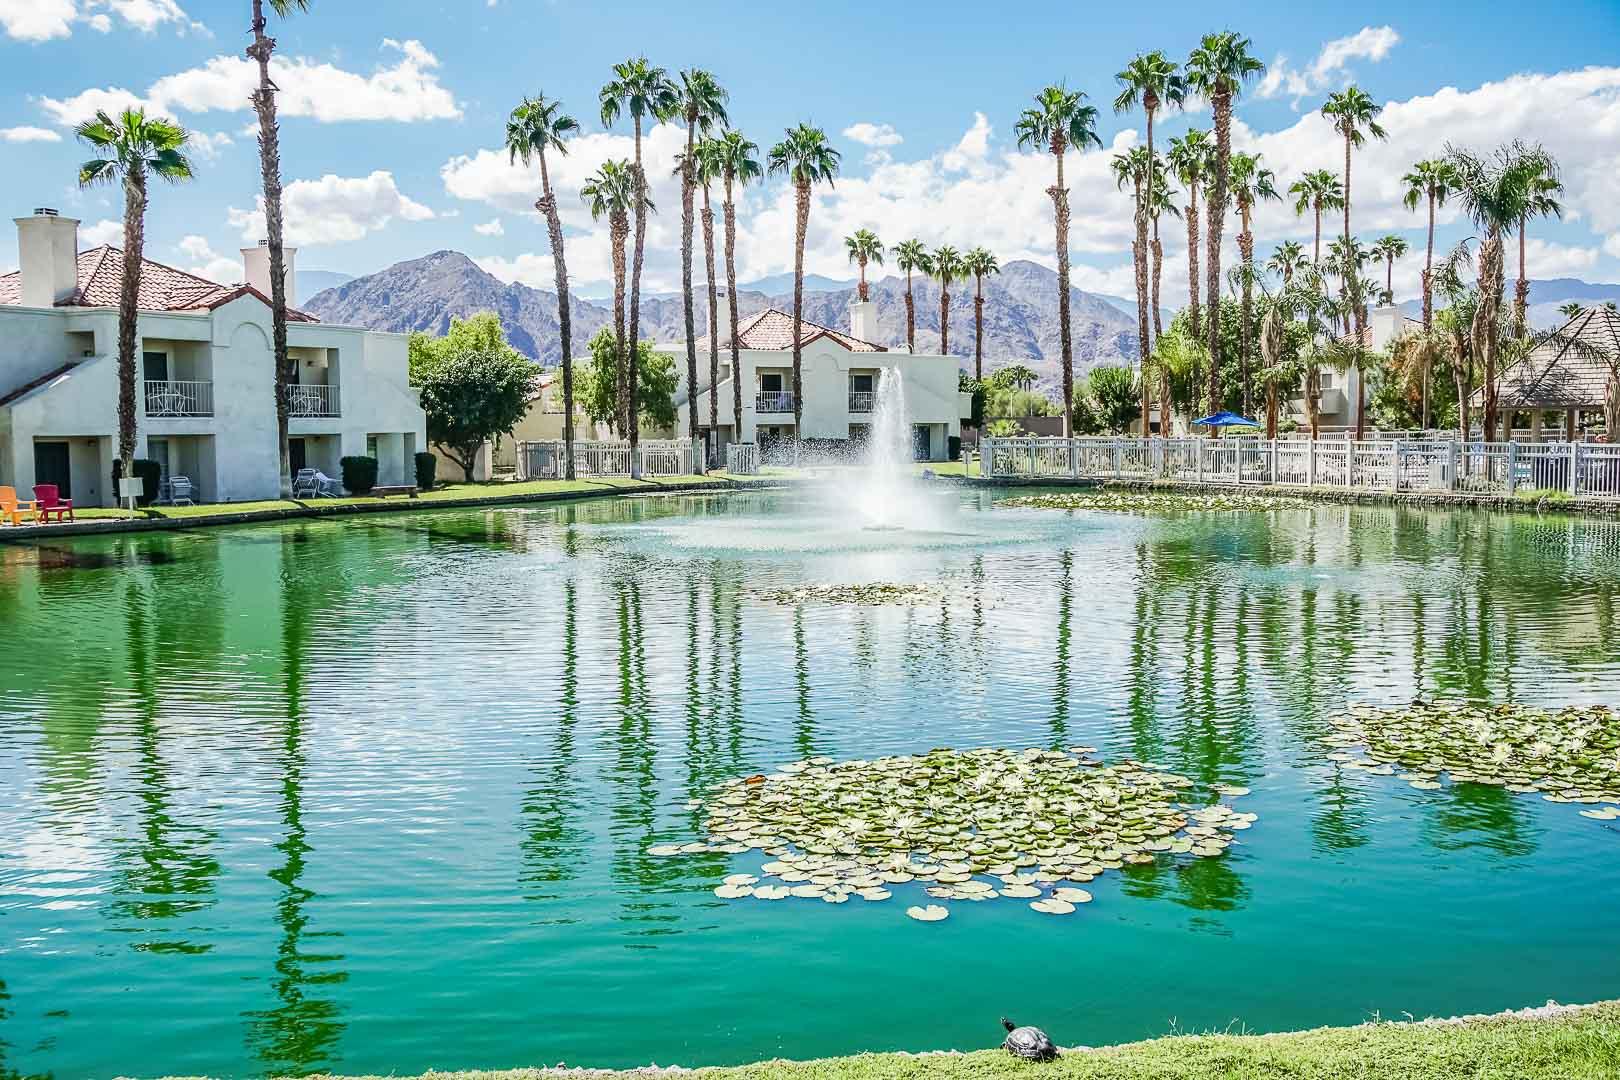 A peaceful view at VRI Americas' Desert Breezes Resort in California